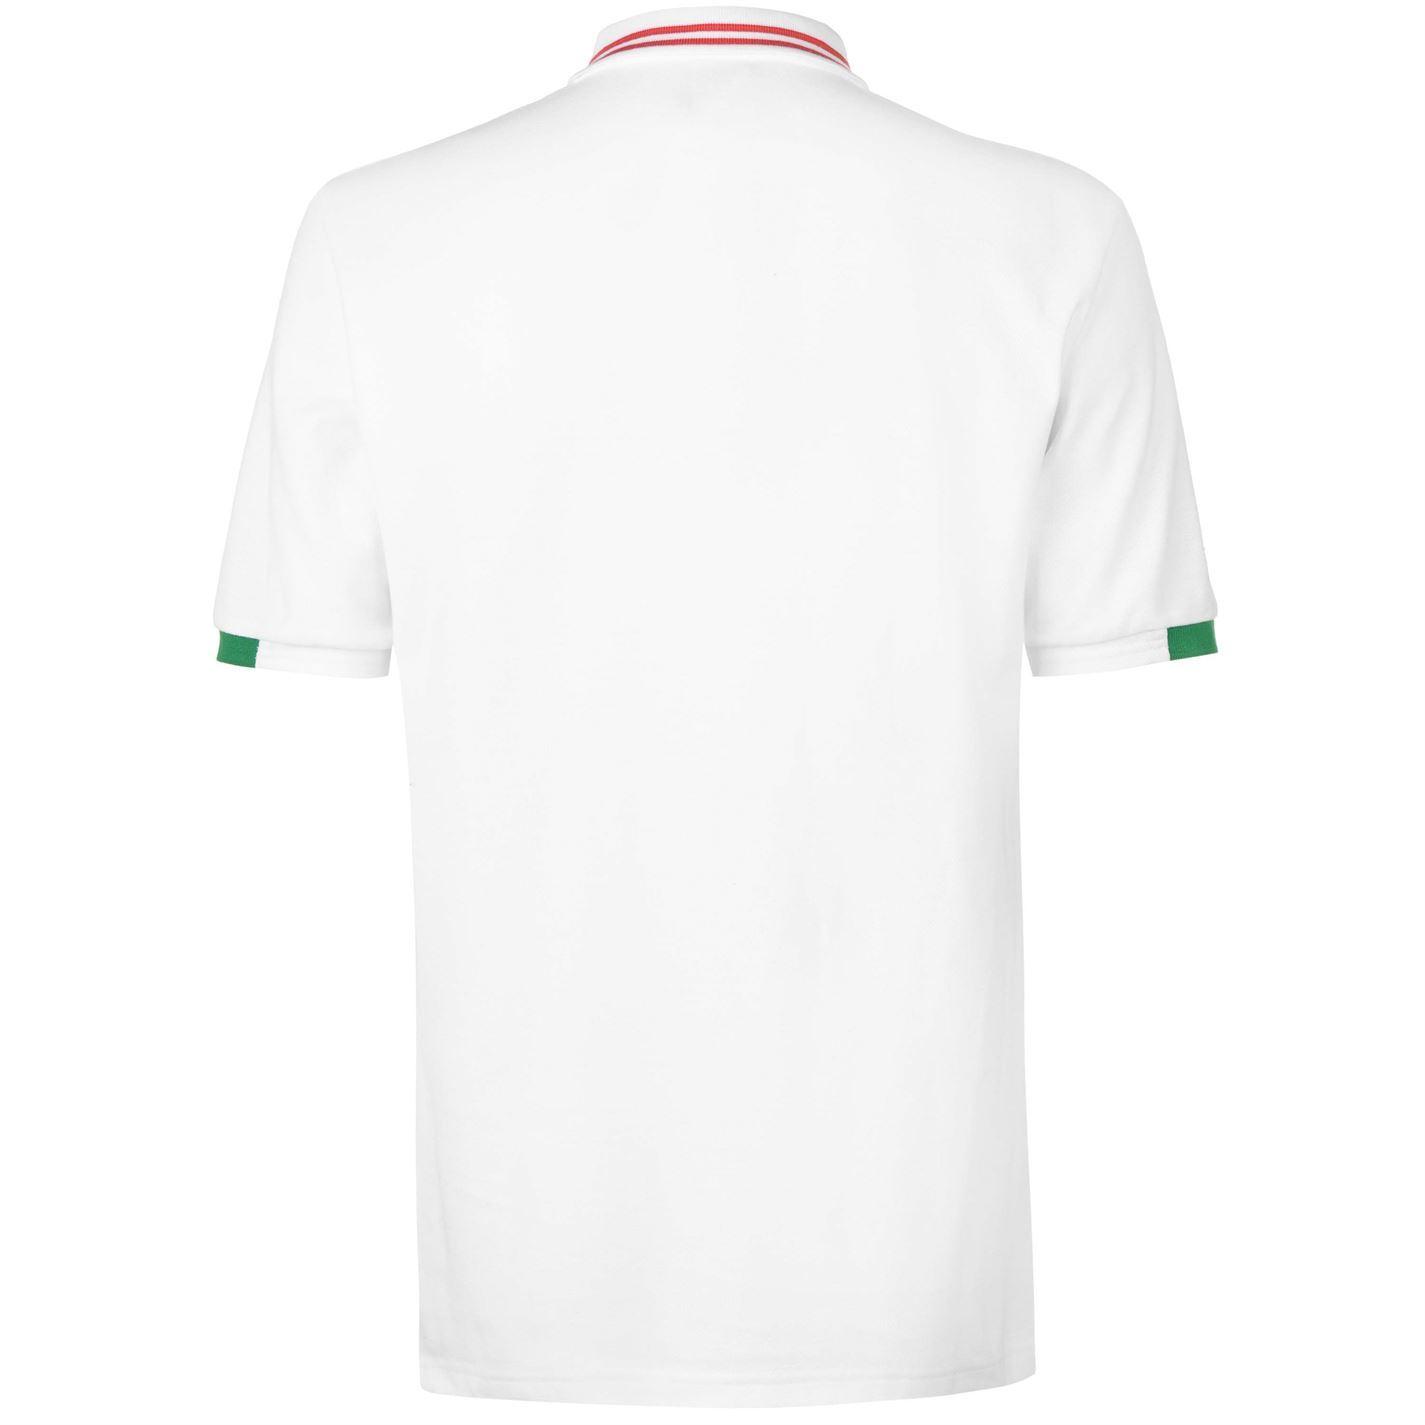 9473450a55 FIFA World Cup 2018 Mexico Polo Shirt Mens White Football Soccer Top T-Shirt